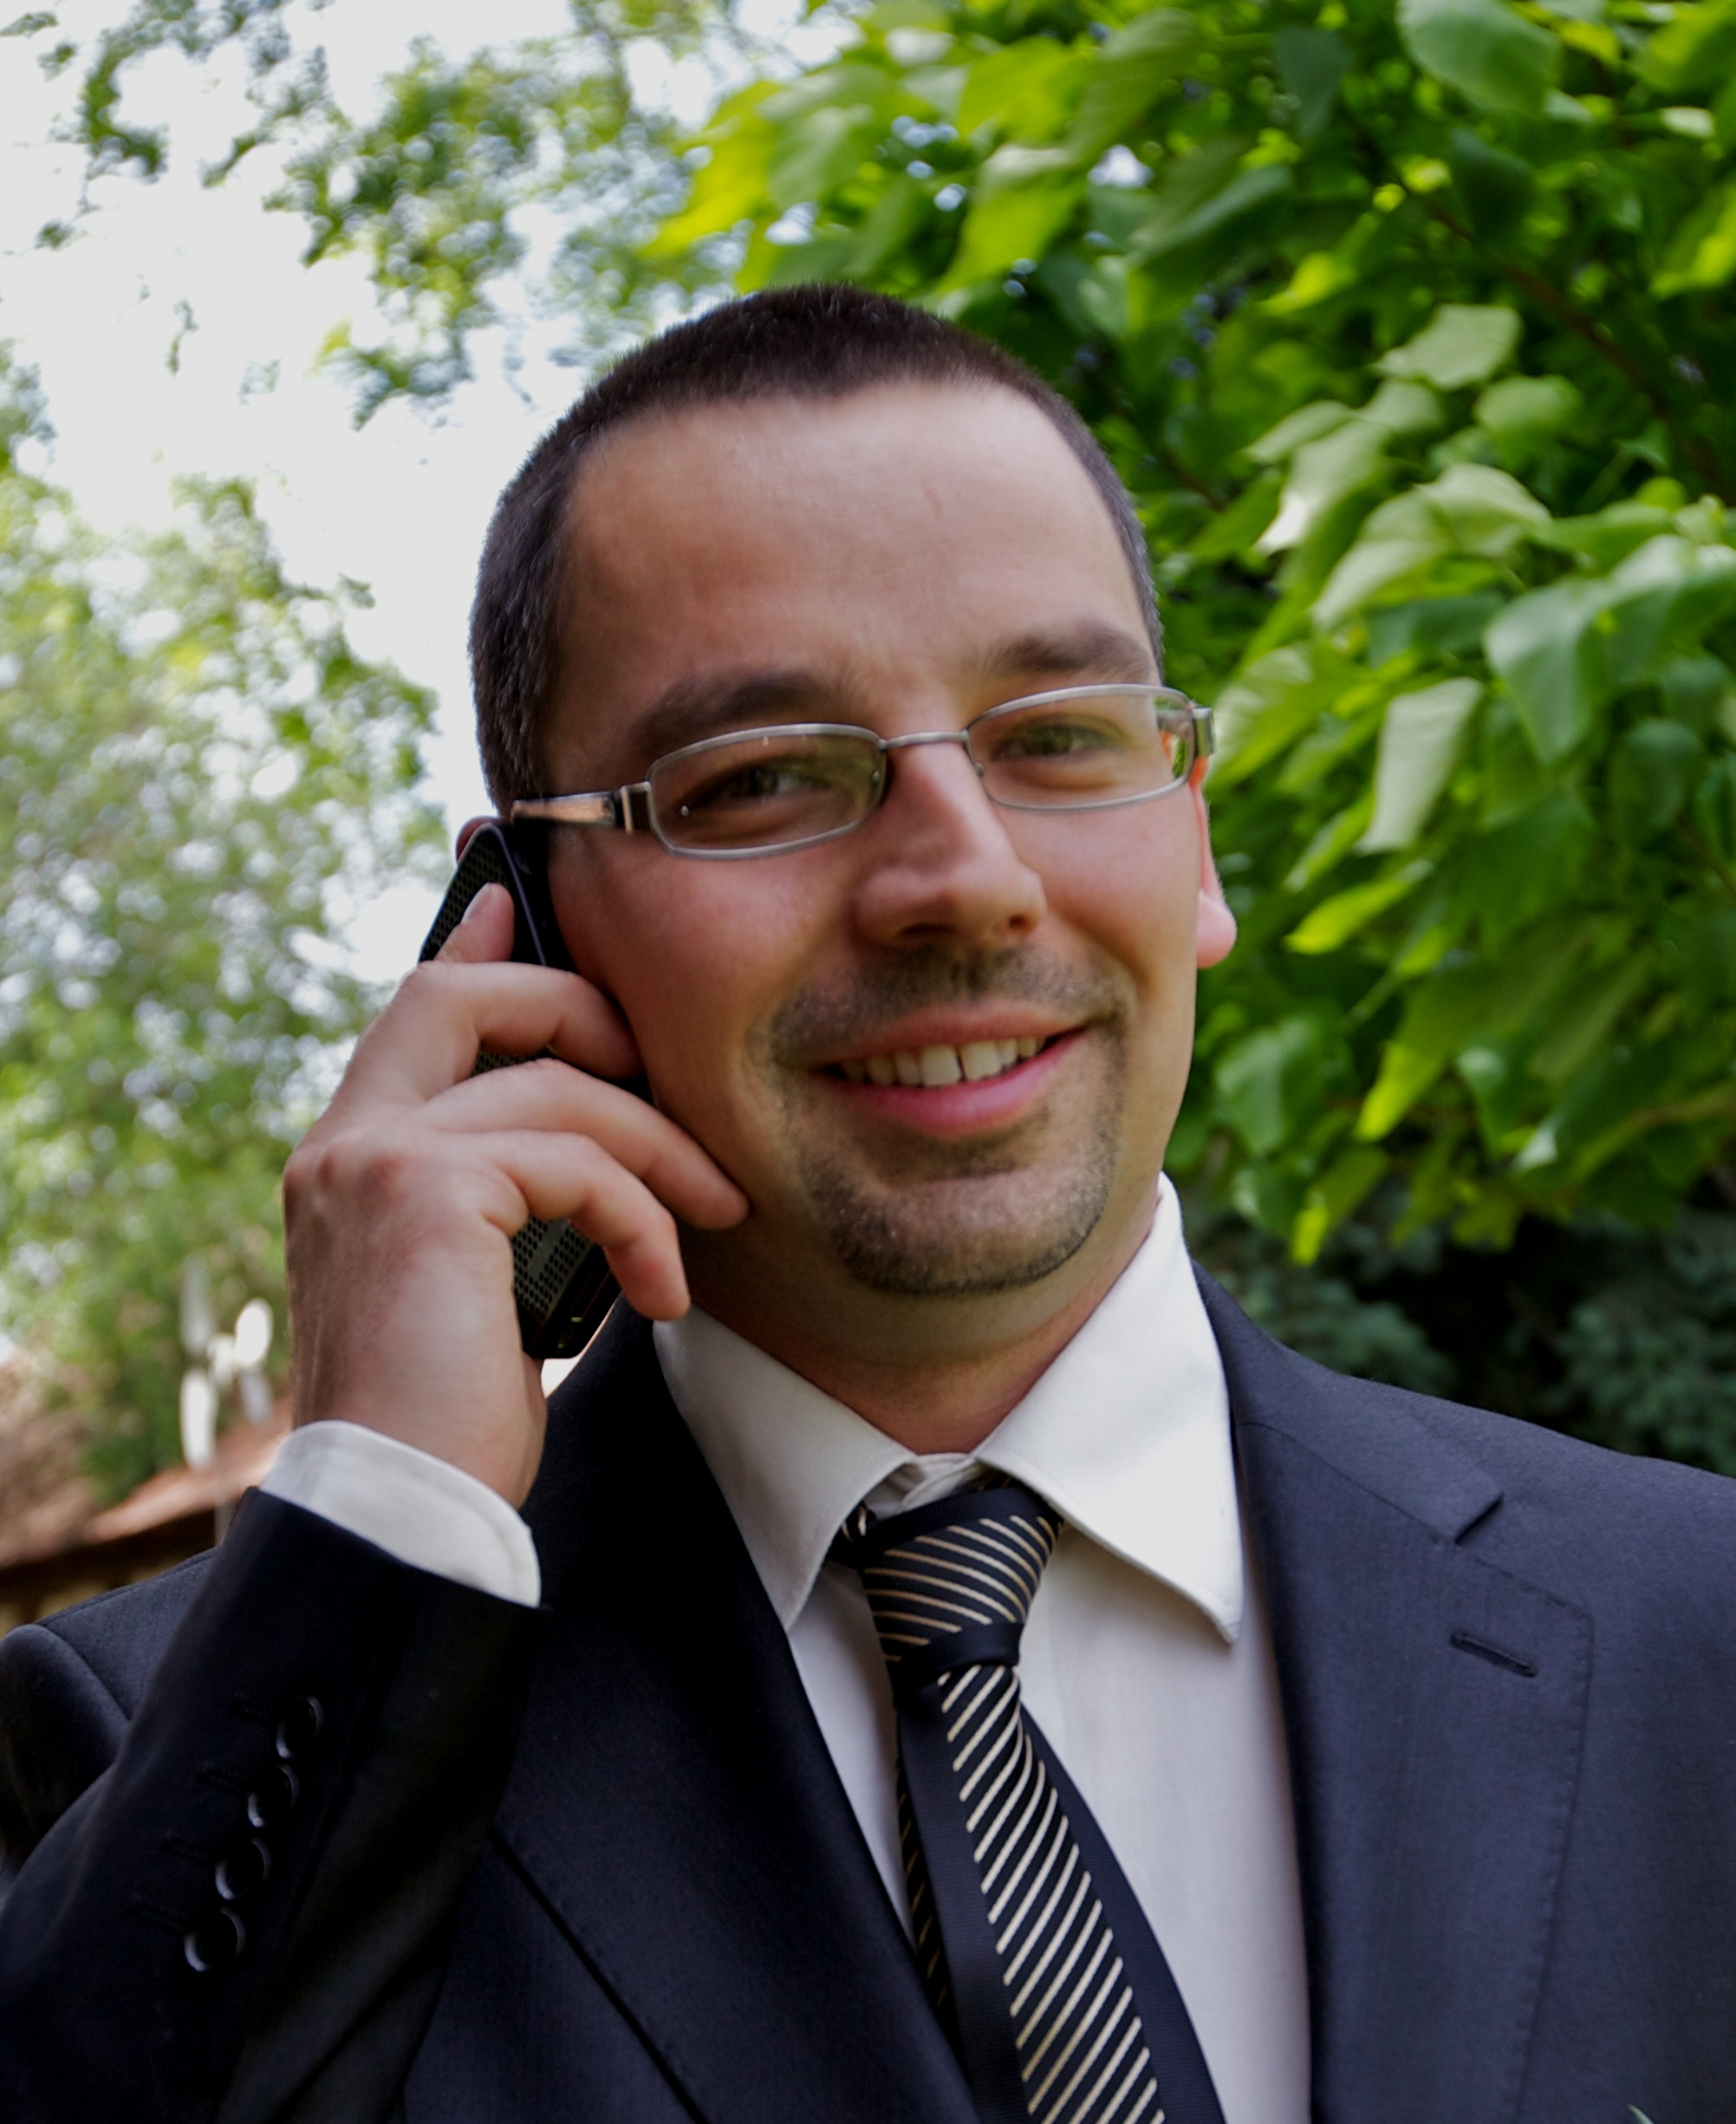 Marki Zoltan